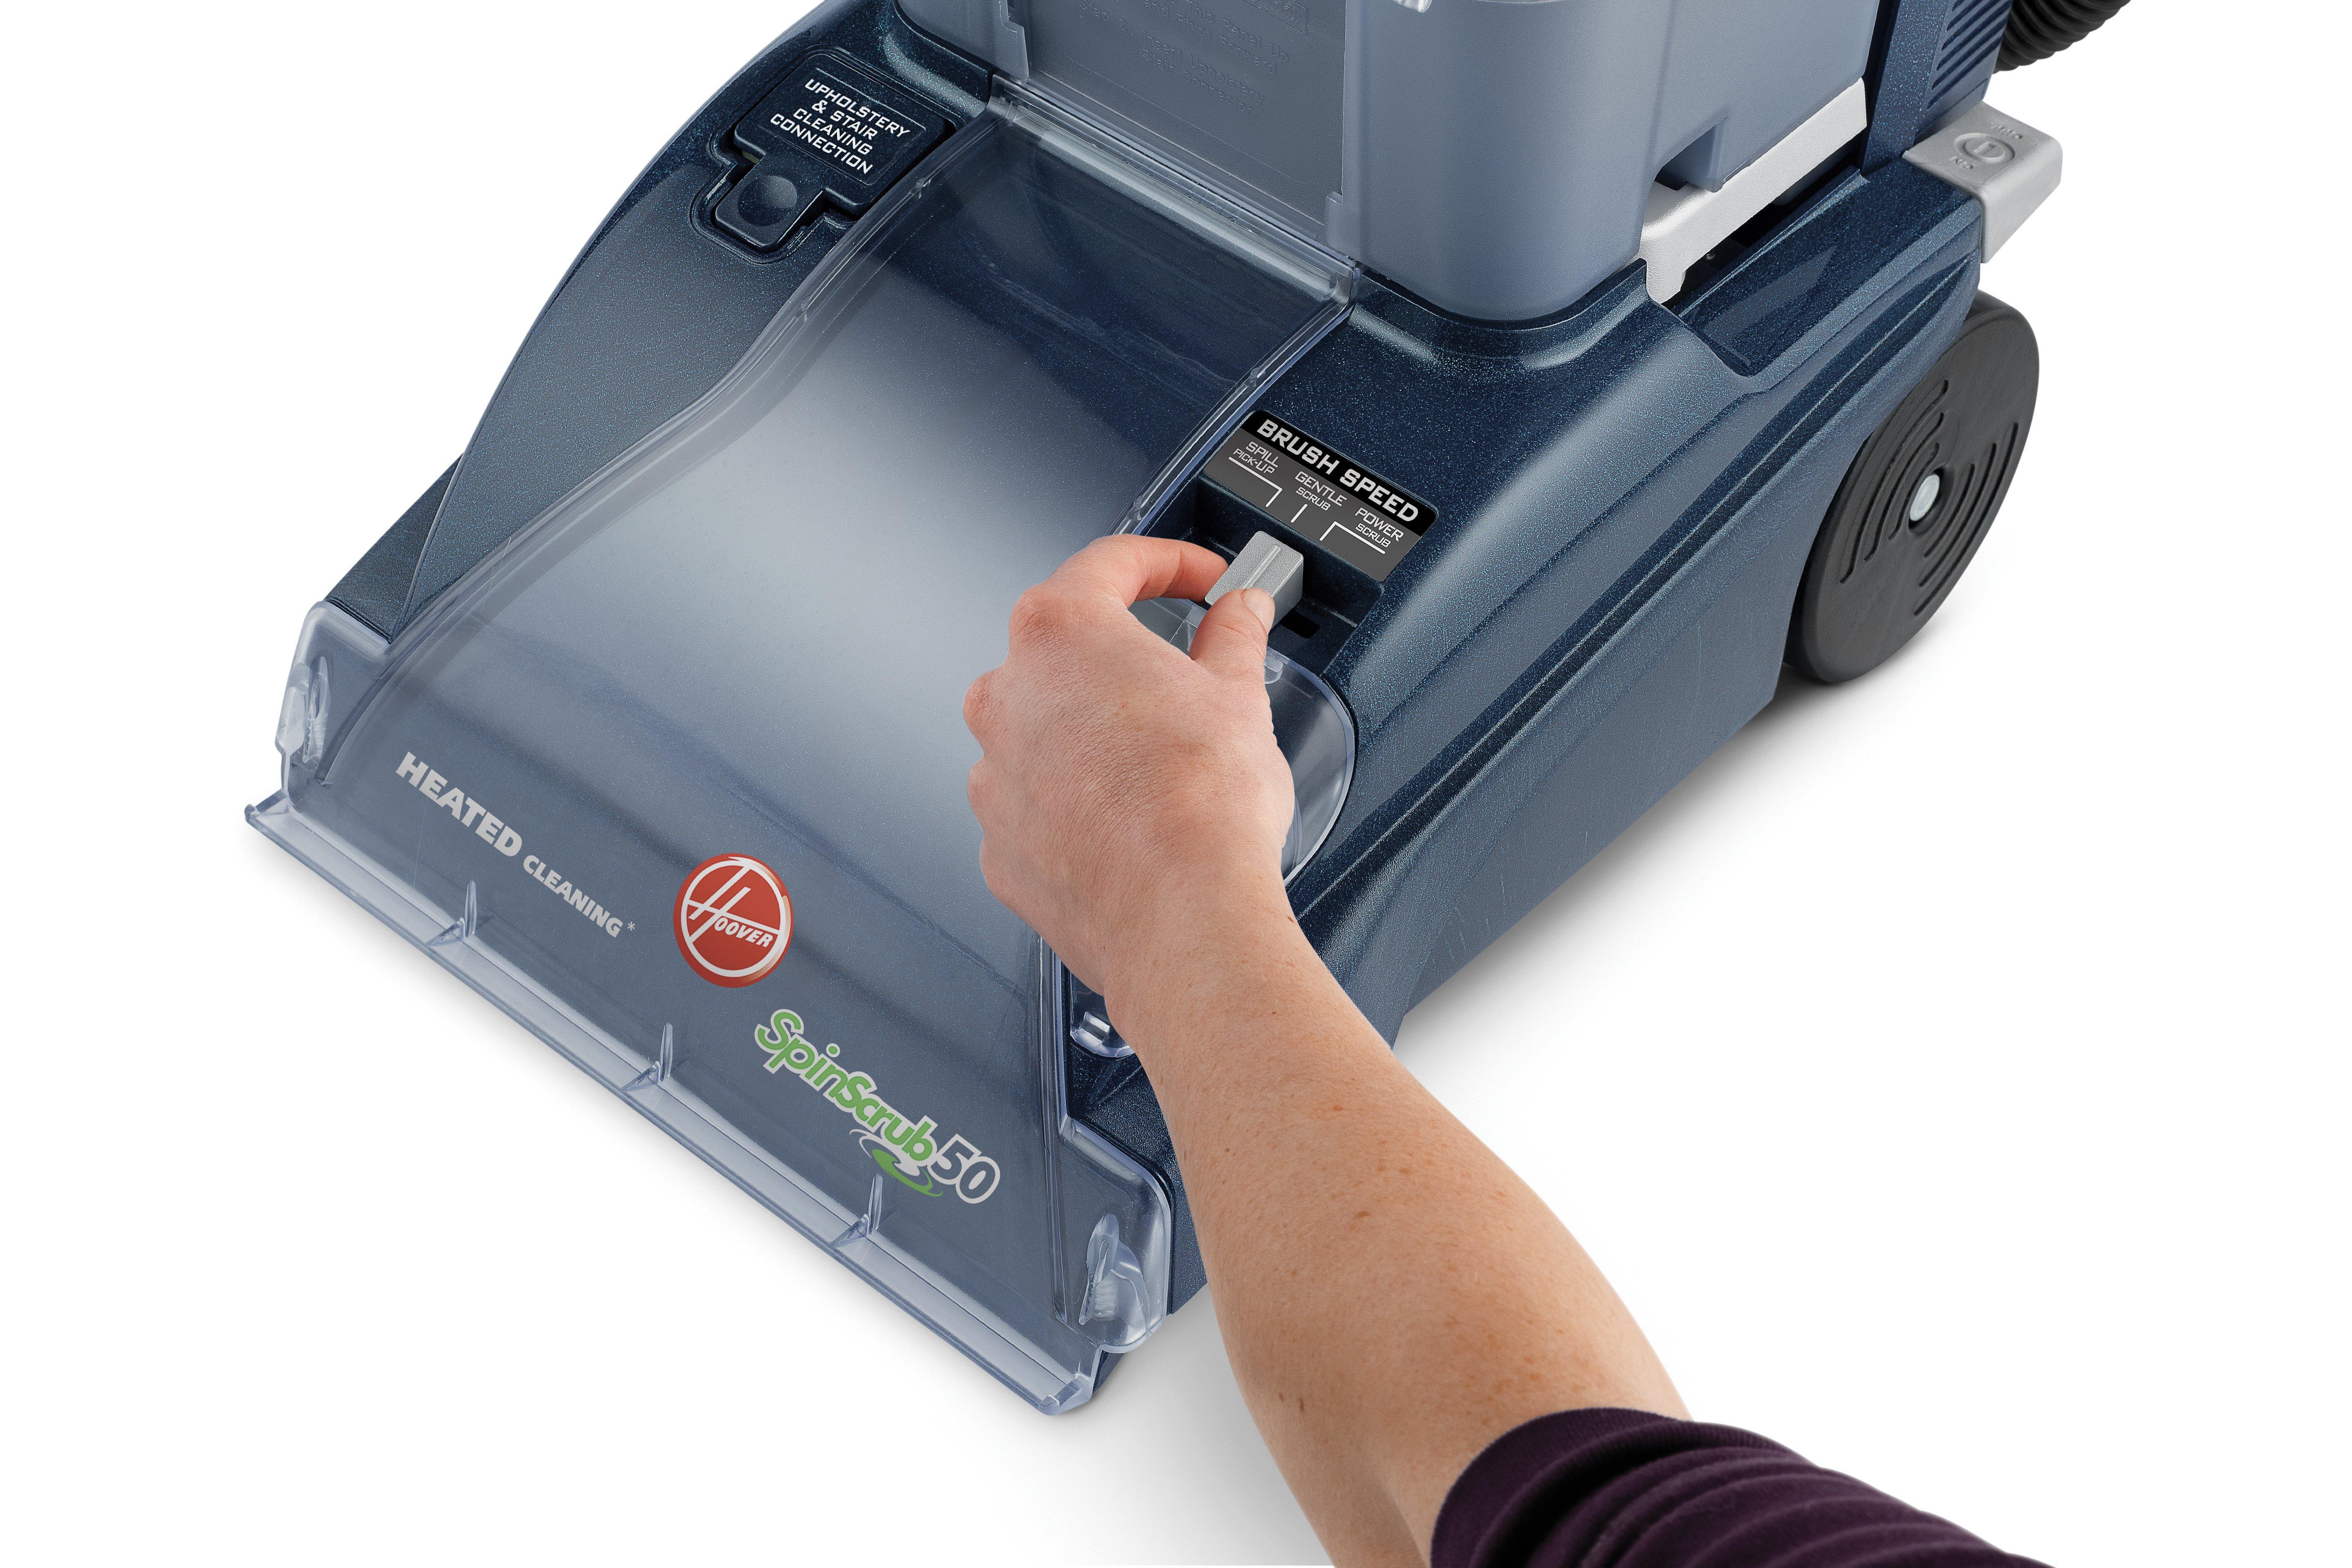 SteamVac SpinScrub with CleanSurge Carpet Cleaner5